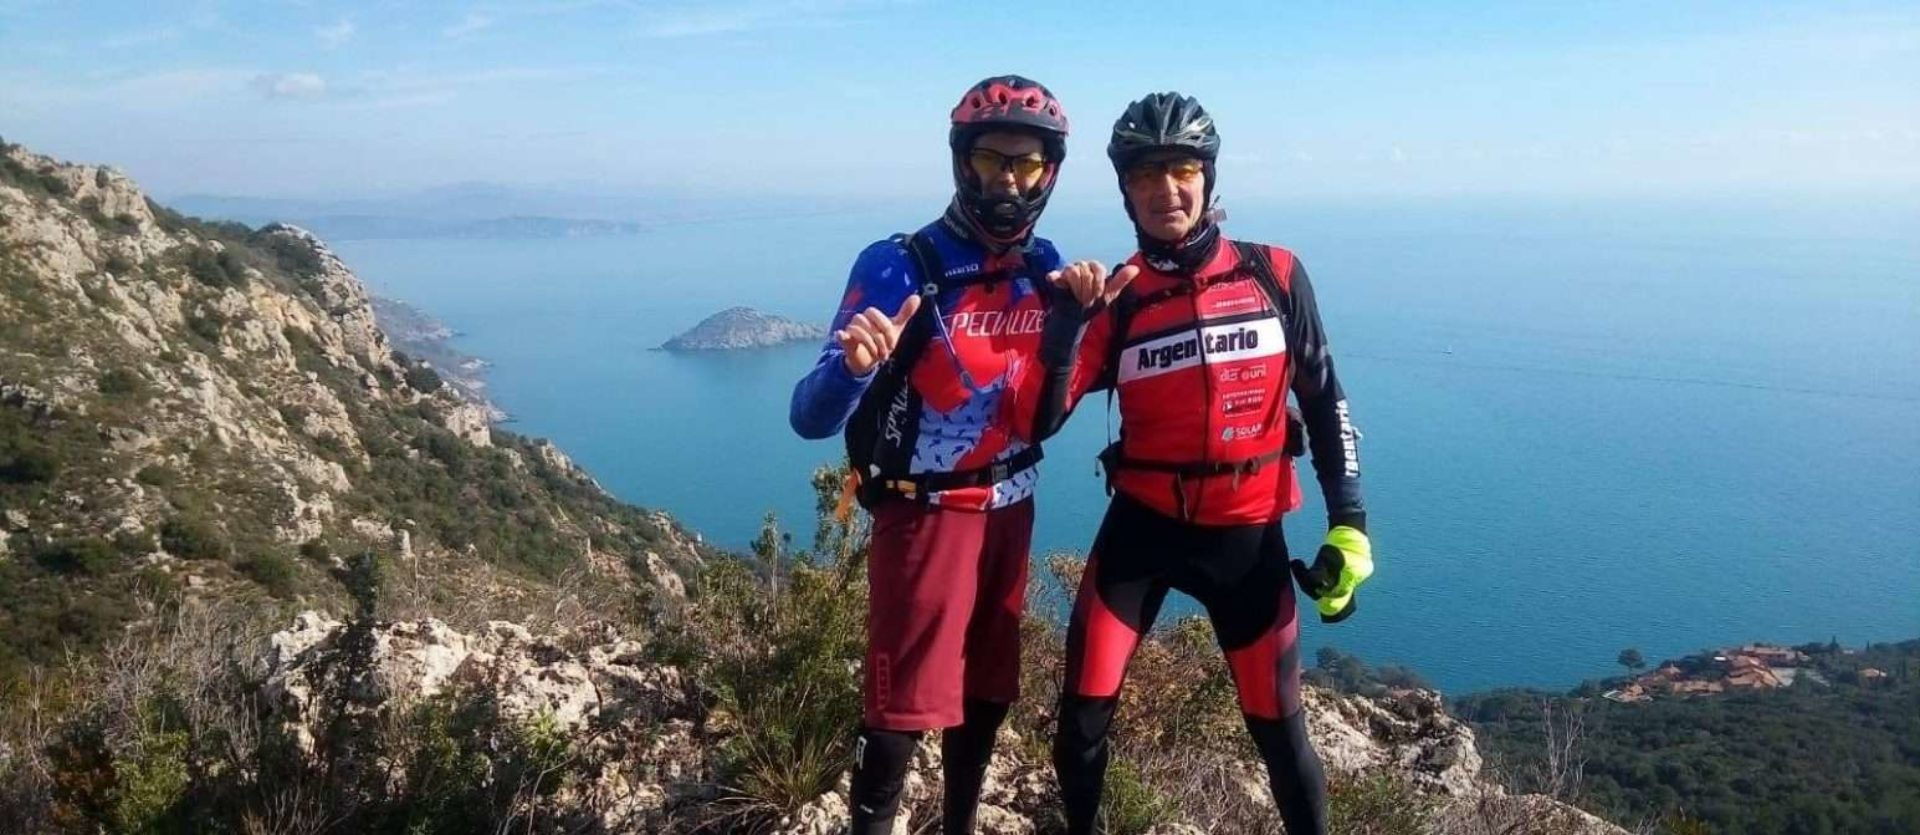 Bike ed E-bike Argentario